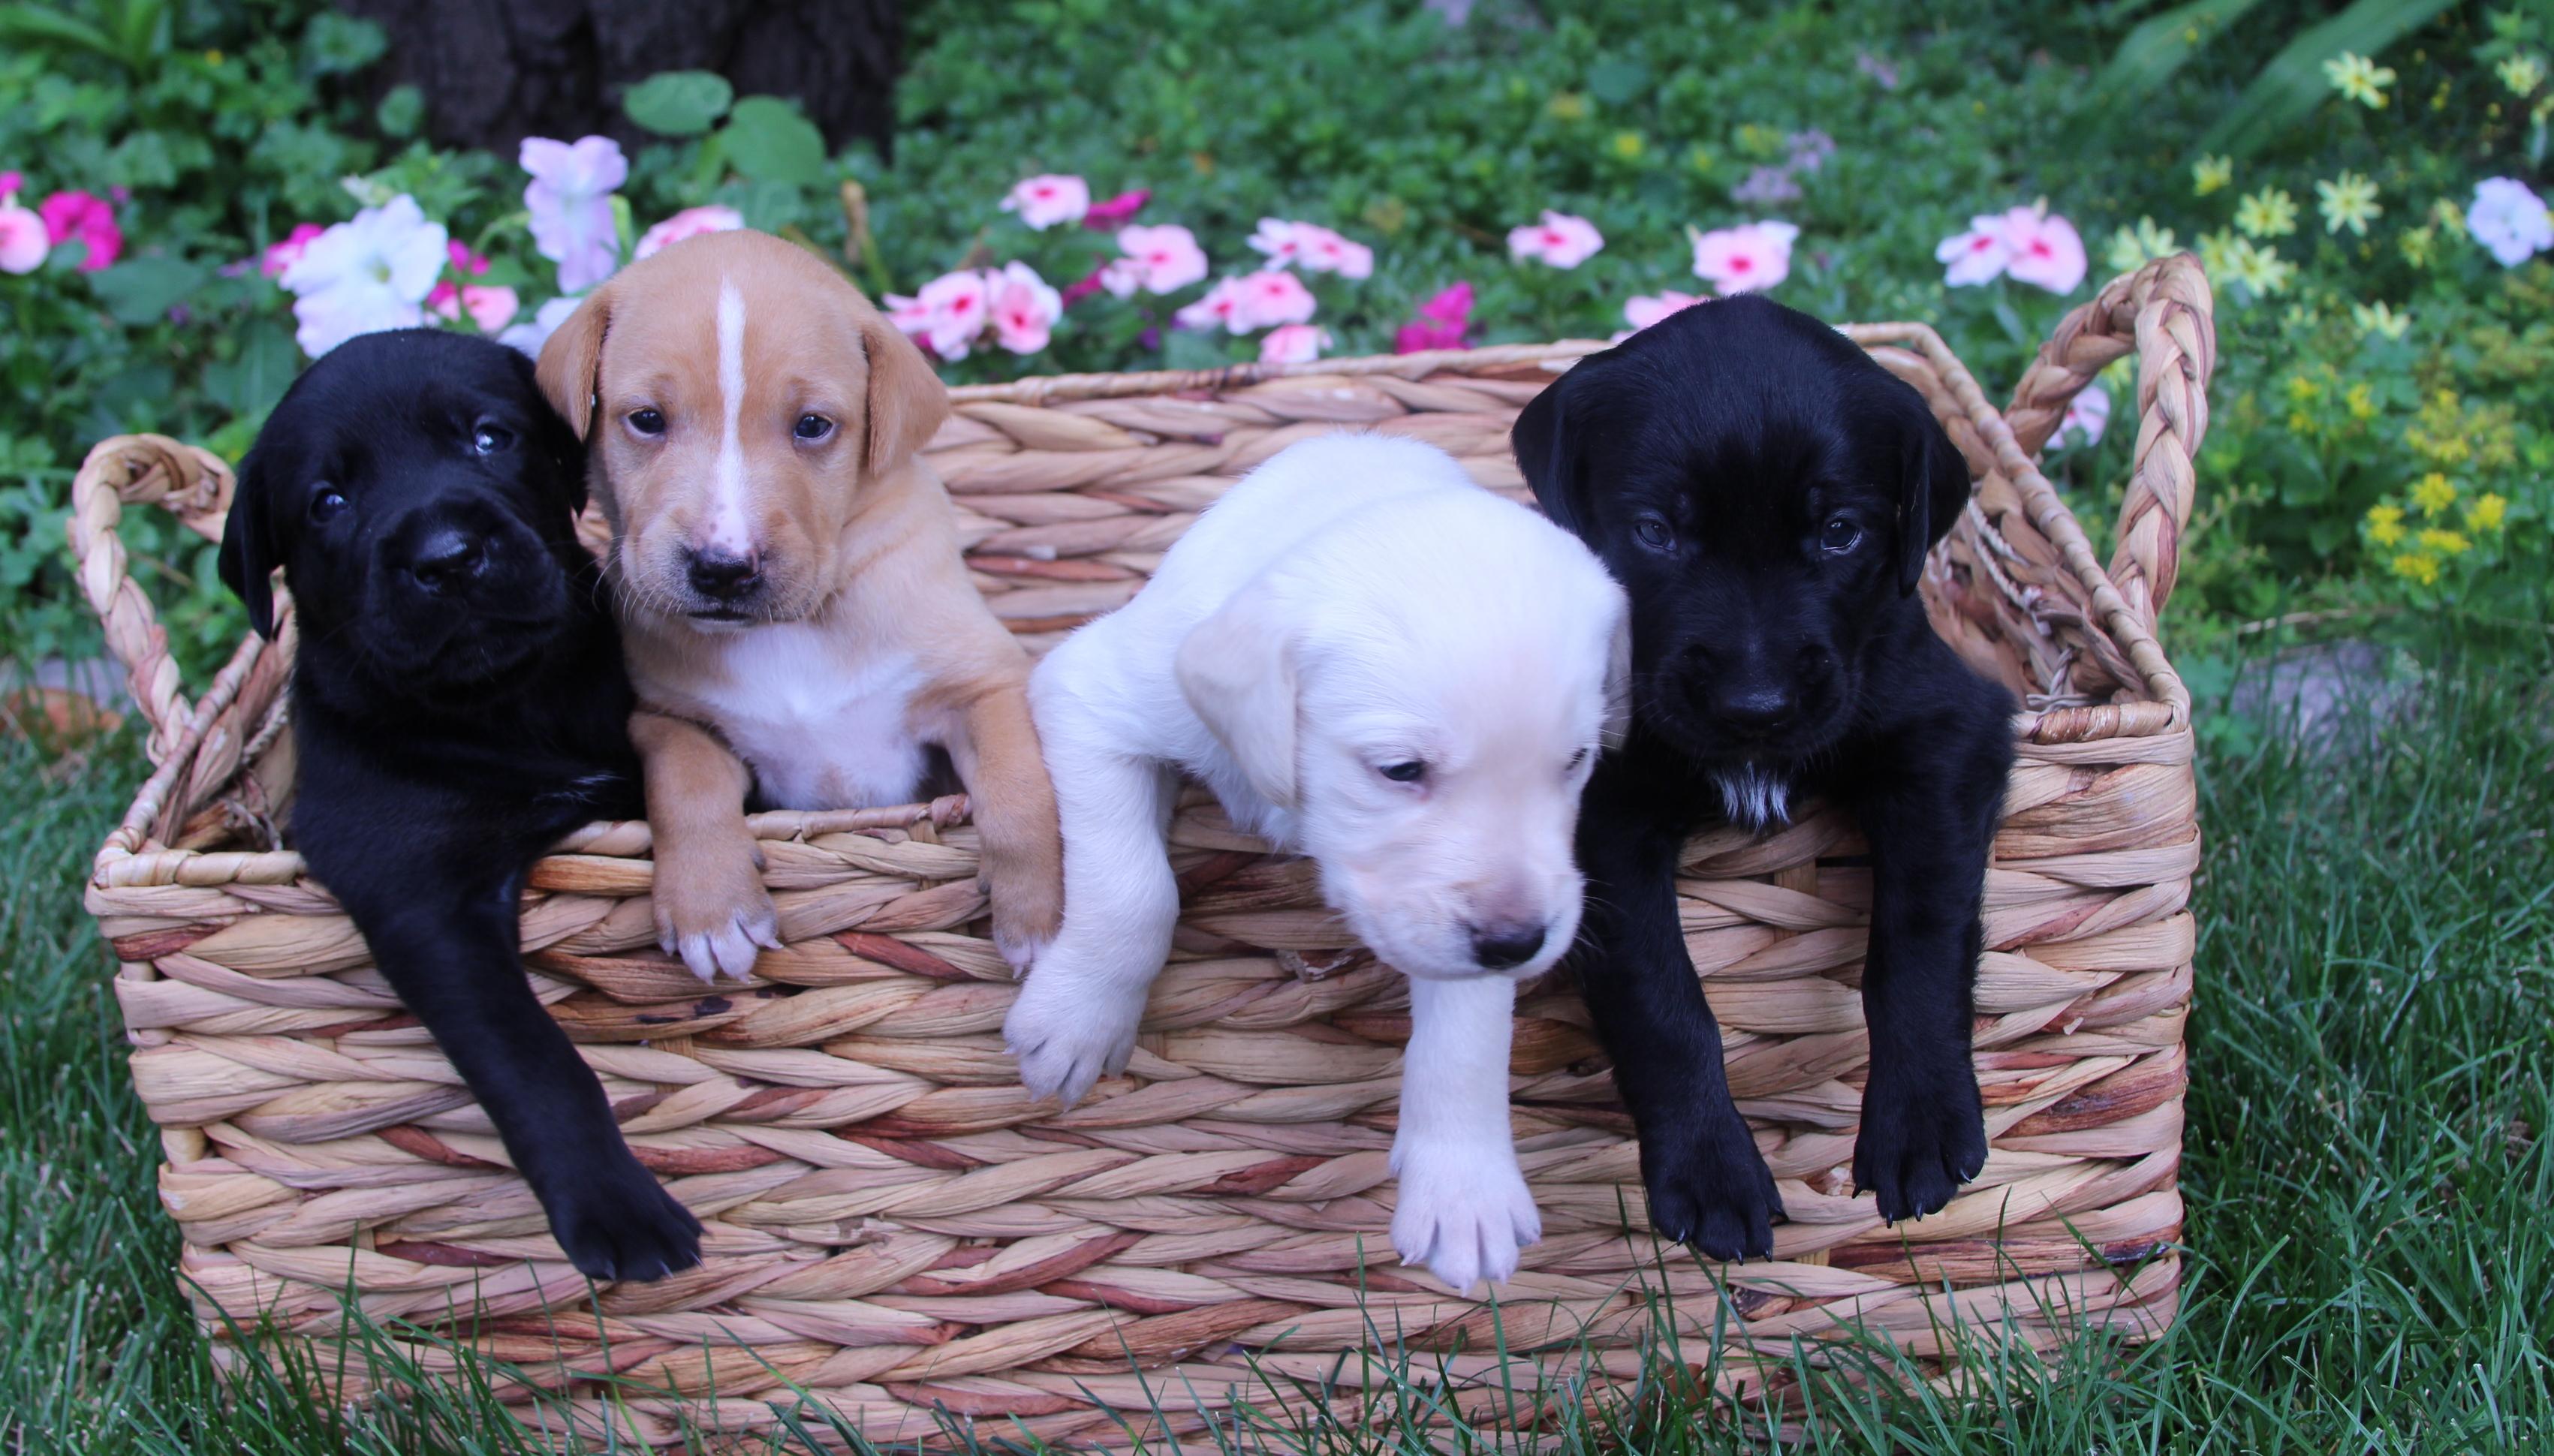 PUPPIES - We are cute little bundles of joy!!